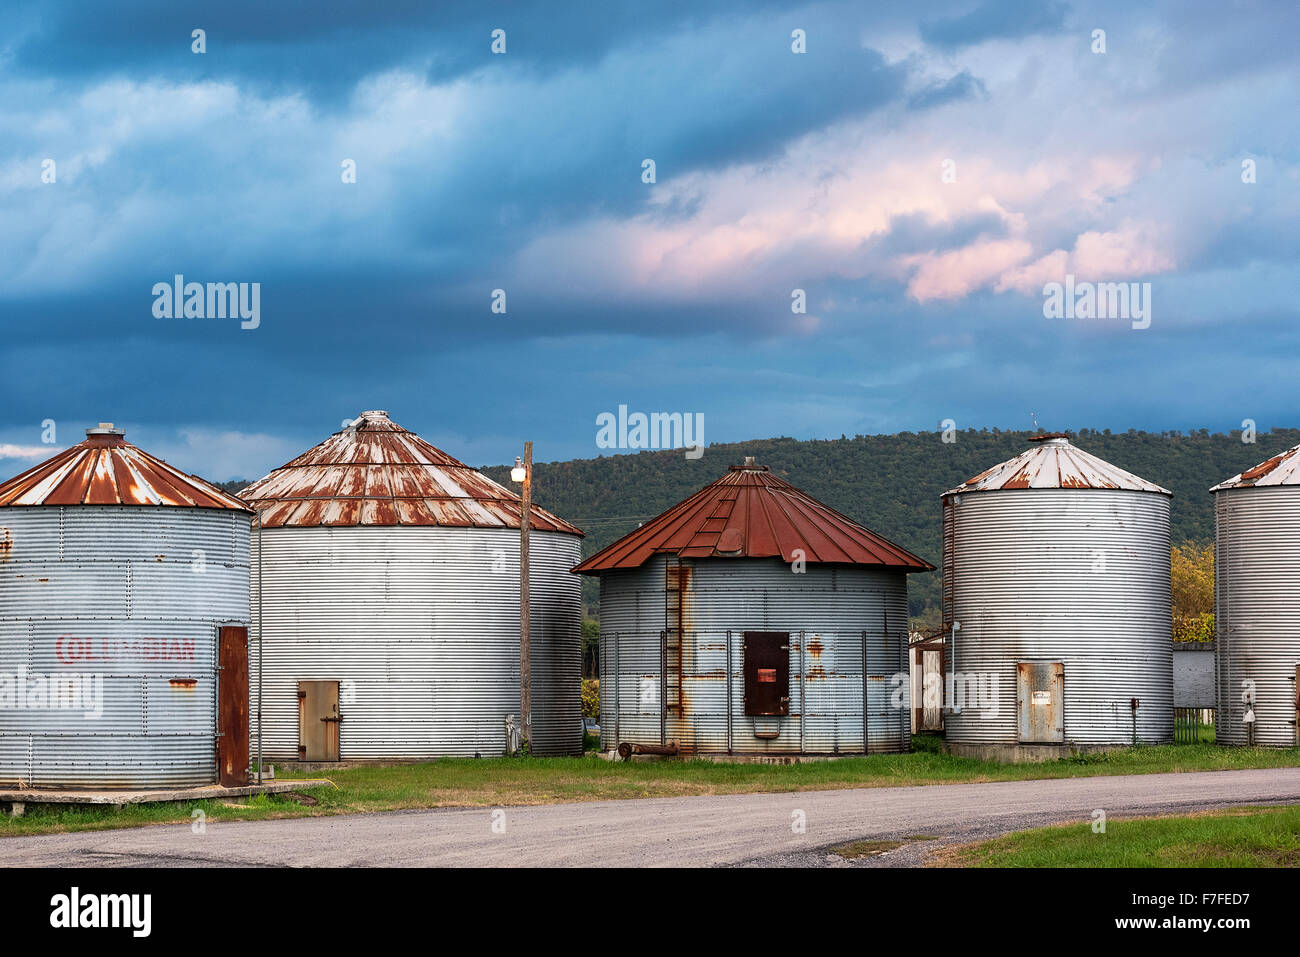 Storage silos, Pennsylvania, USA - Stock Image